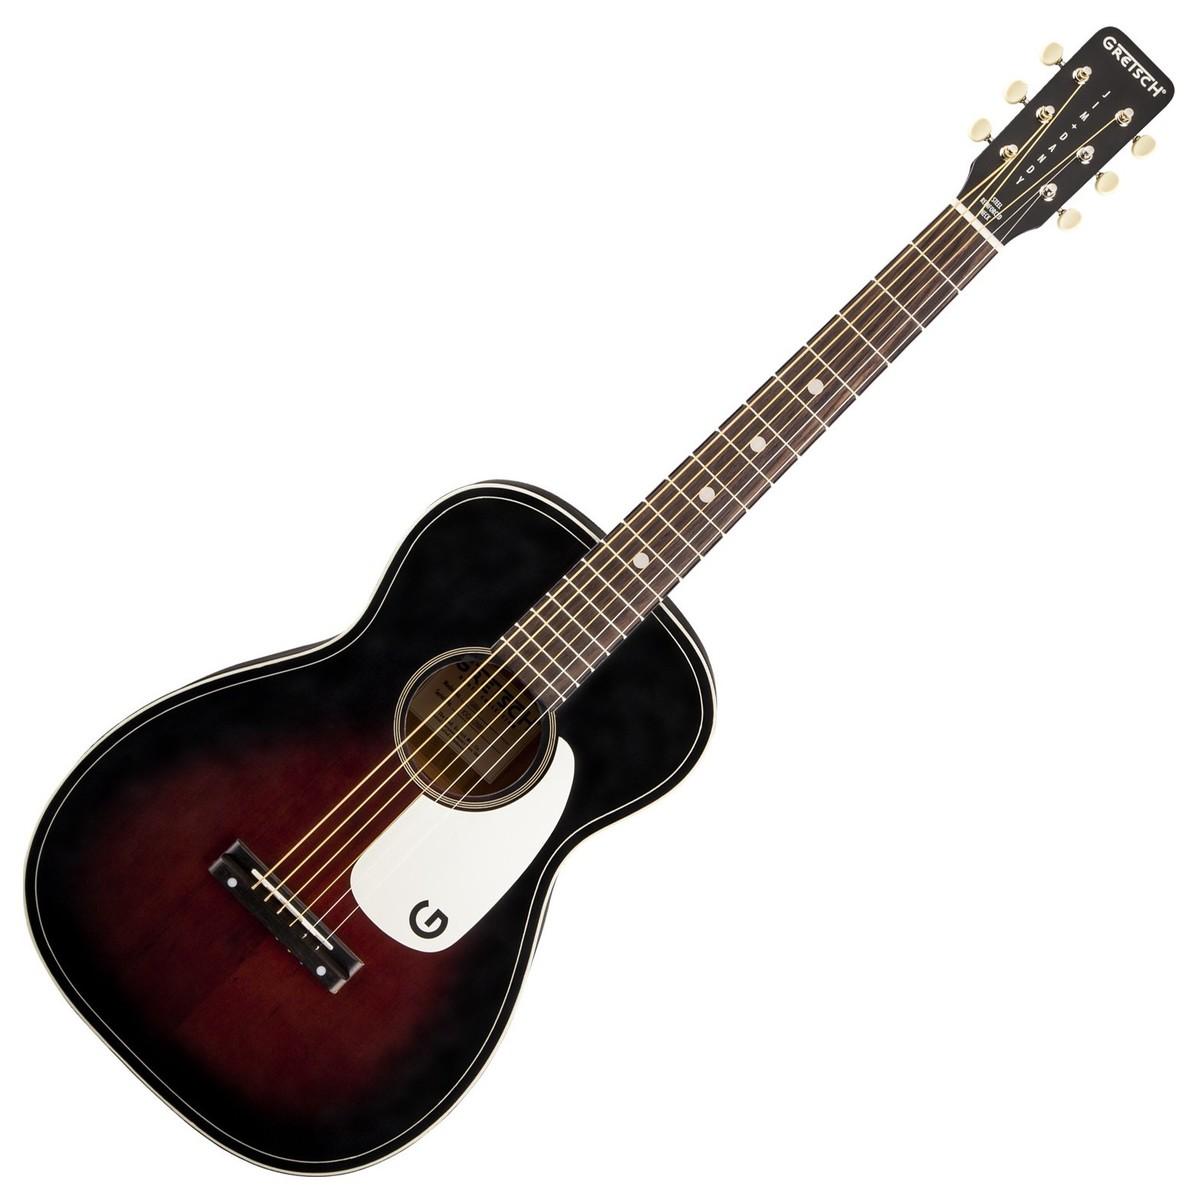 Gretsch G9500 Jim Dandy Flat Top 2SB Acoustic Guitar